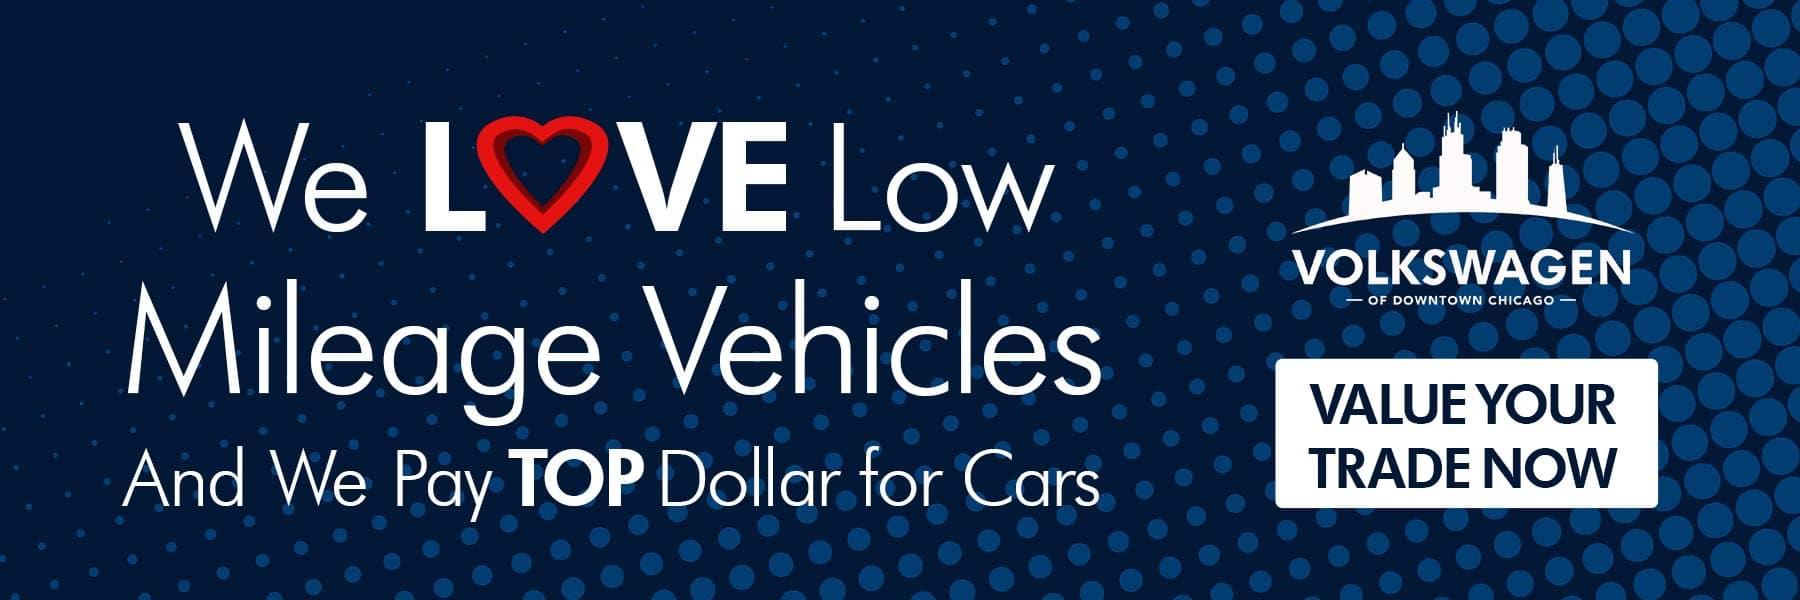 watch dept autobarn dealer car il new chicago city spotlight vw in volkswagen